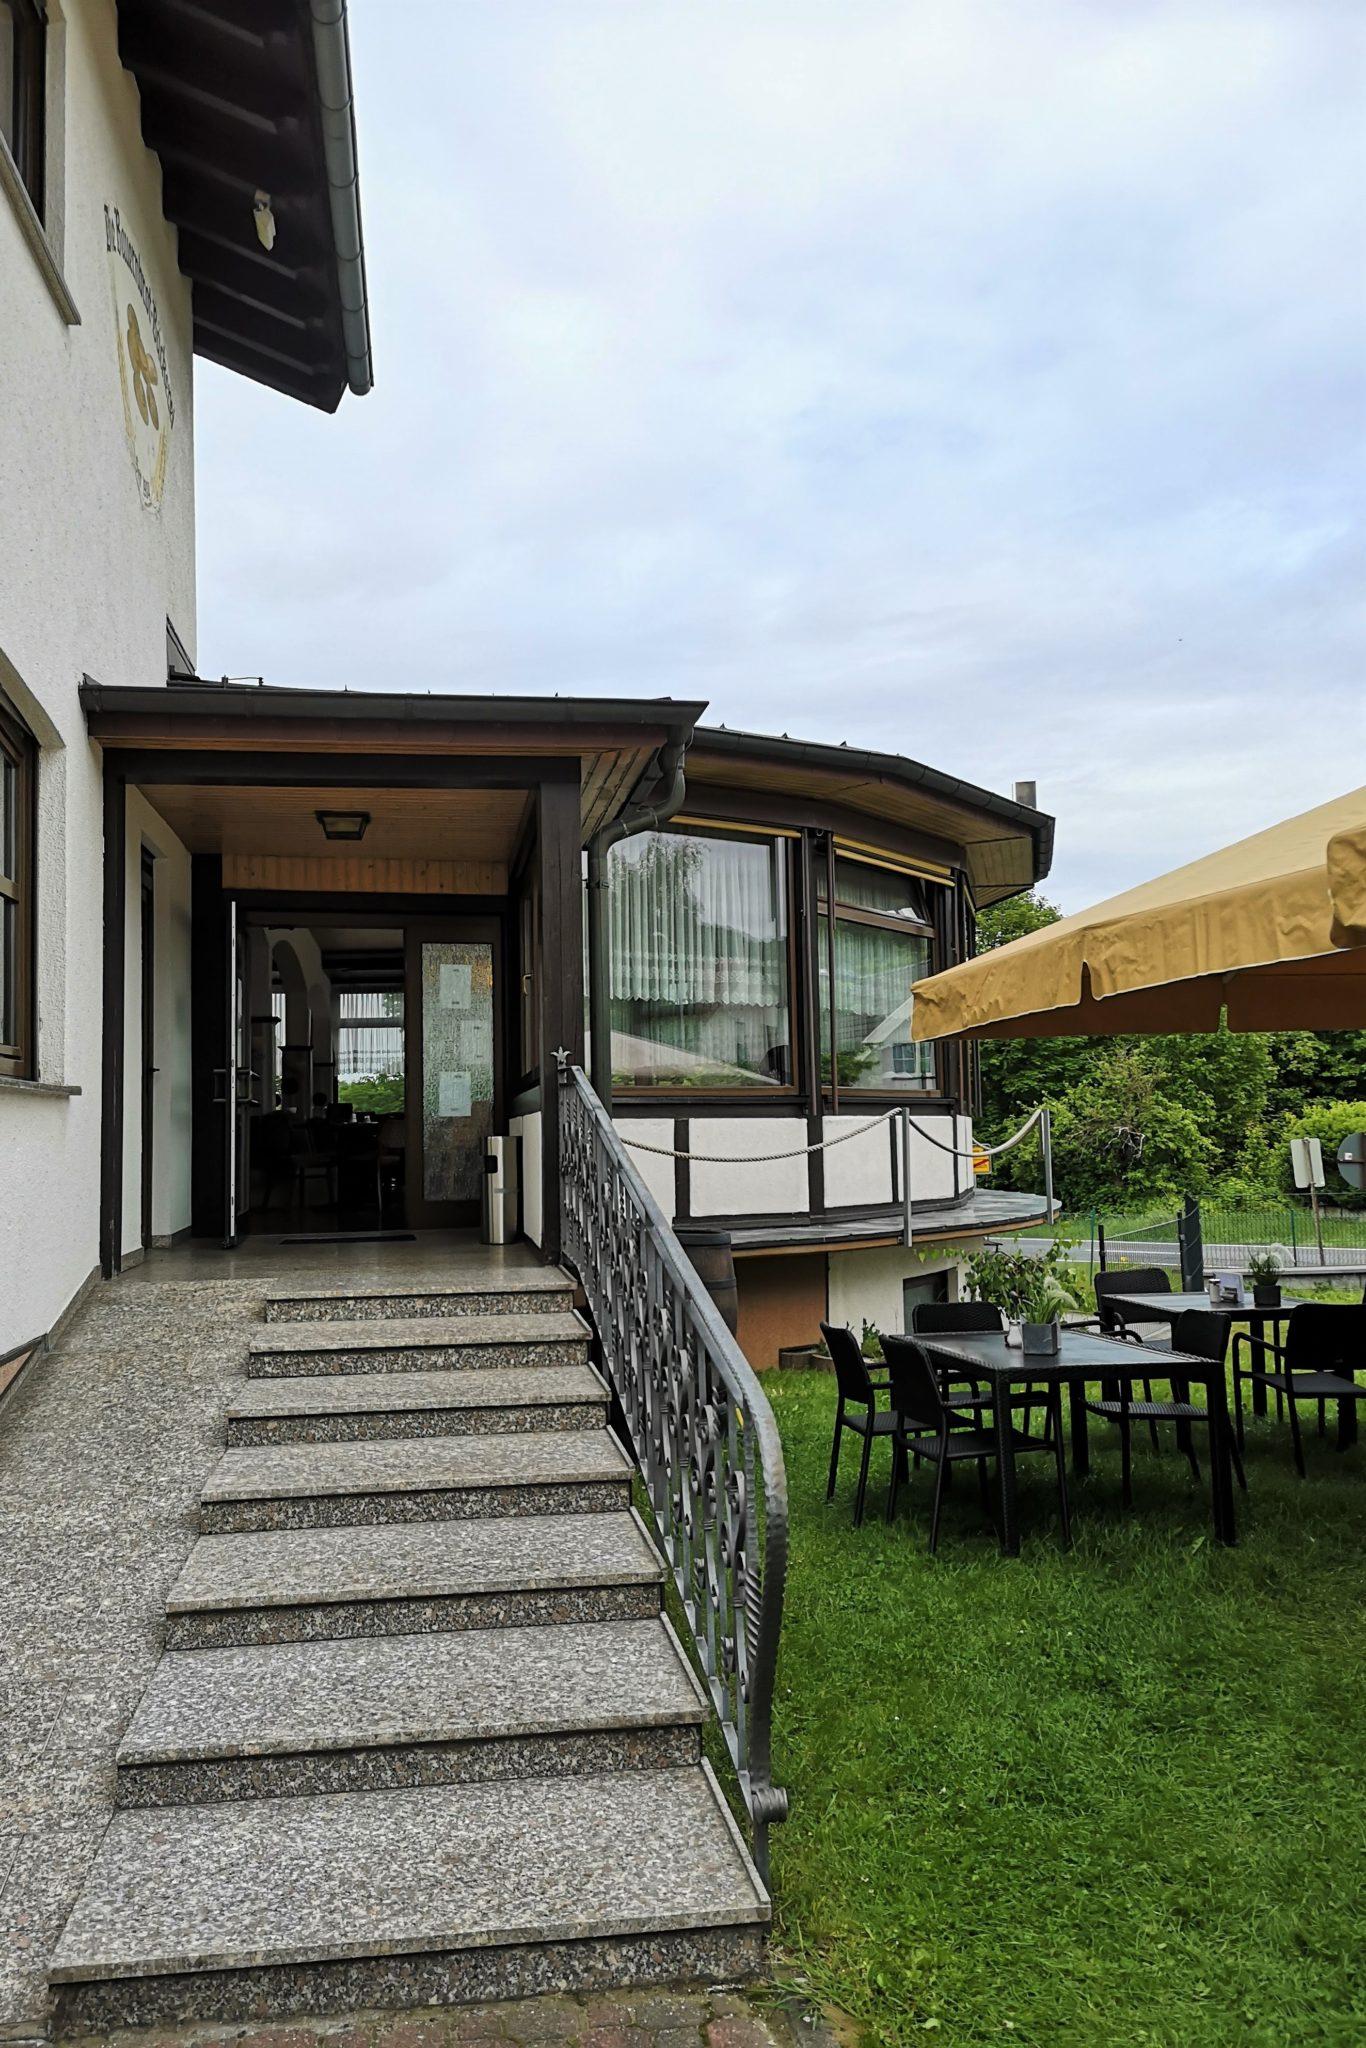 Odenwald Café Hofmann in Moldau